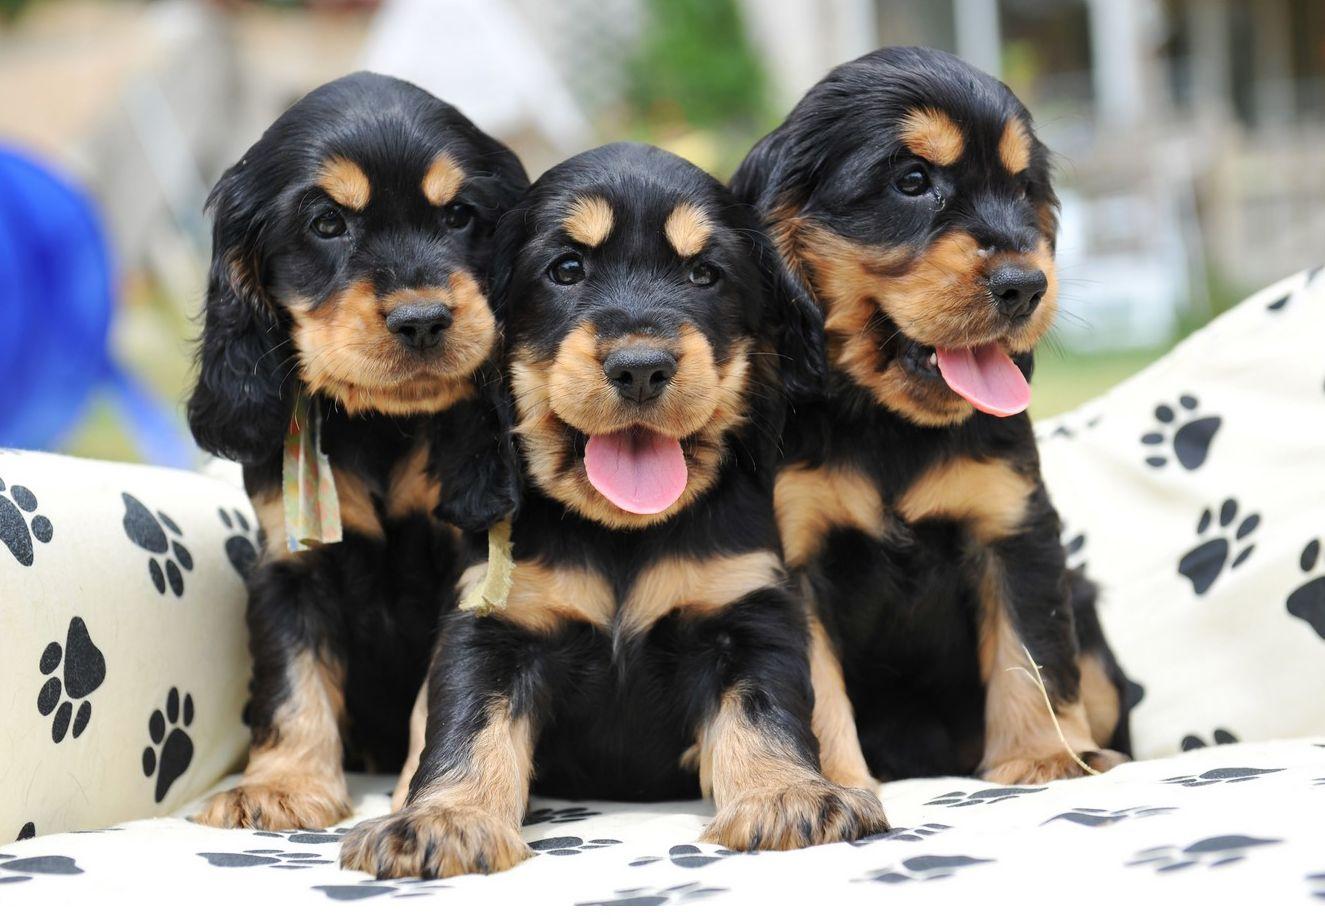 Ver fotos de perritos cachorros 85